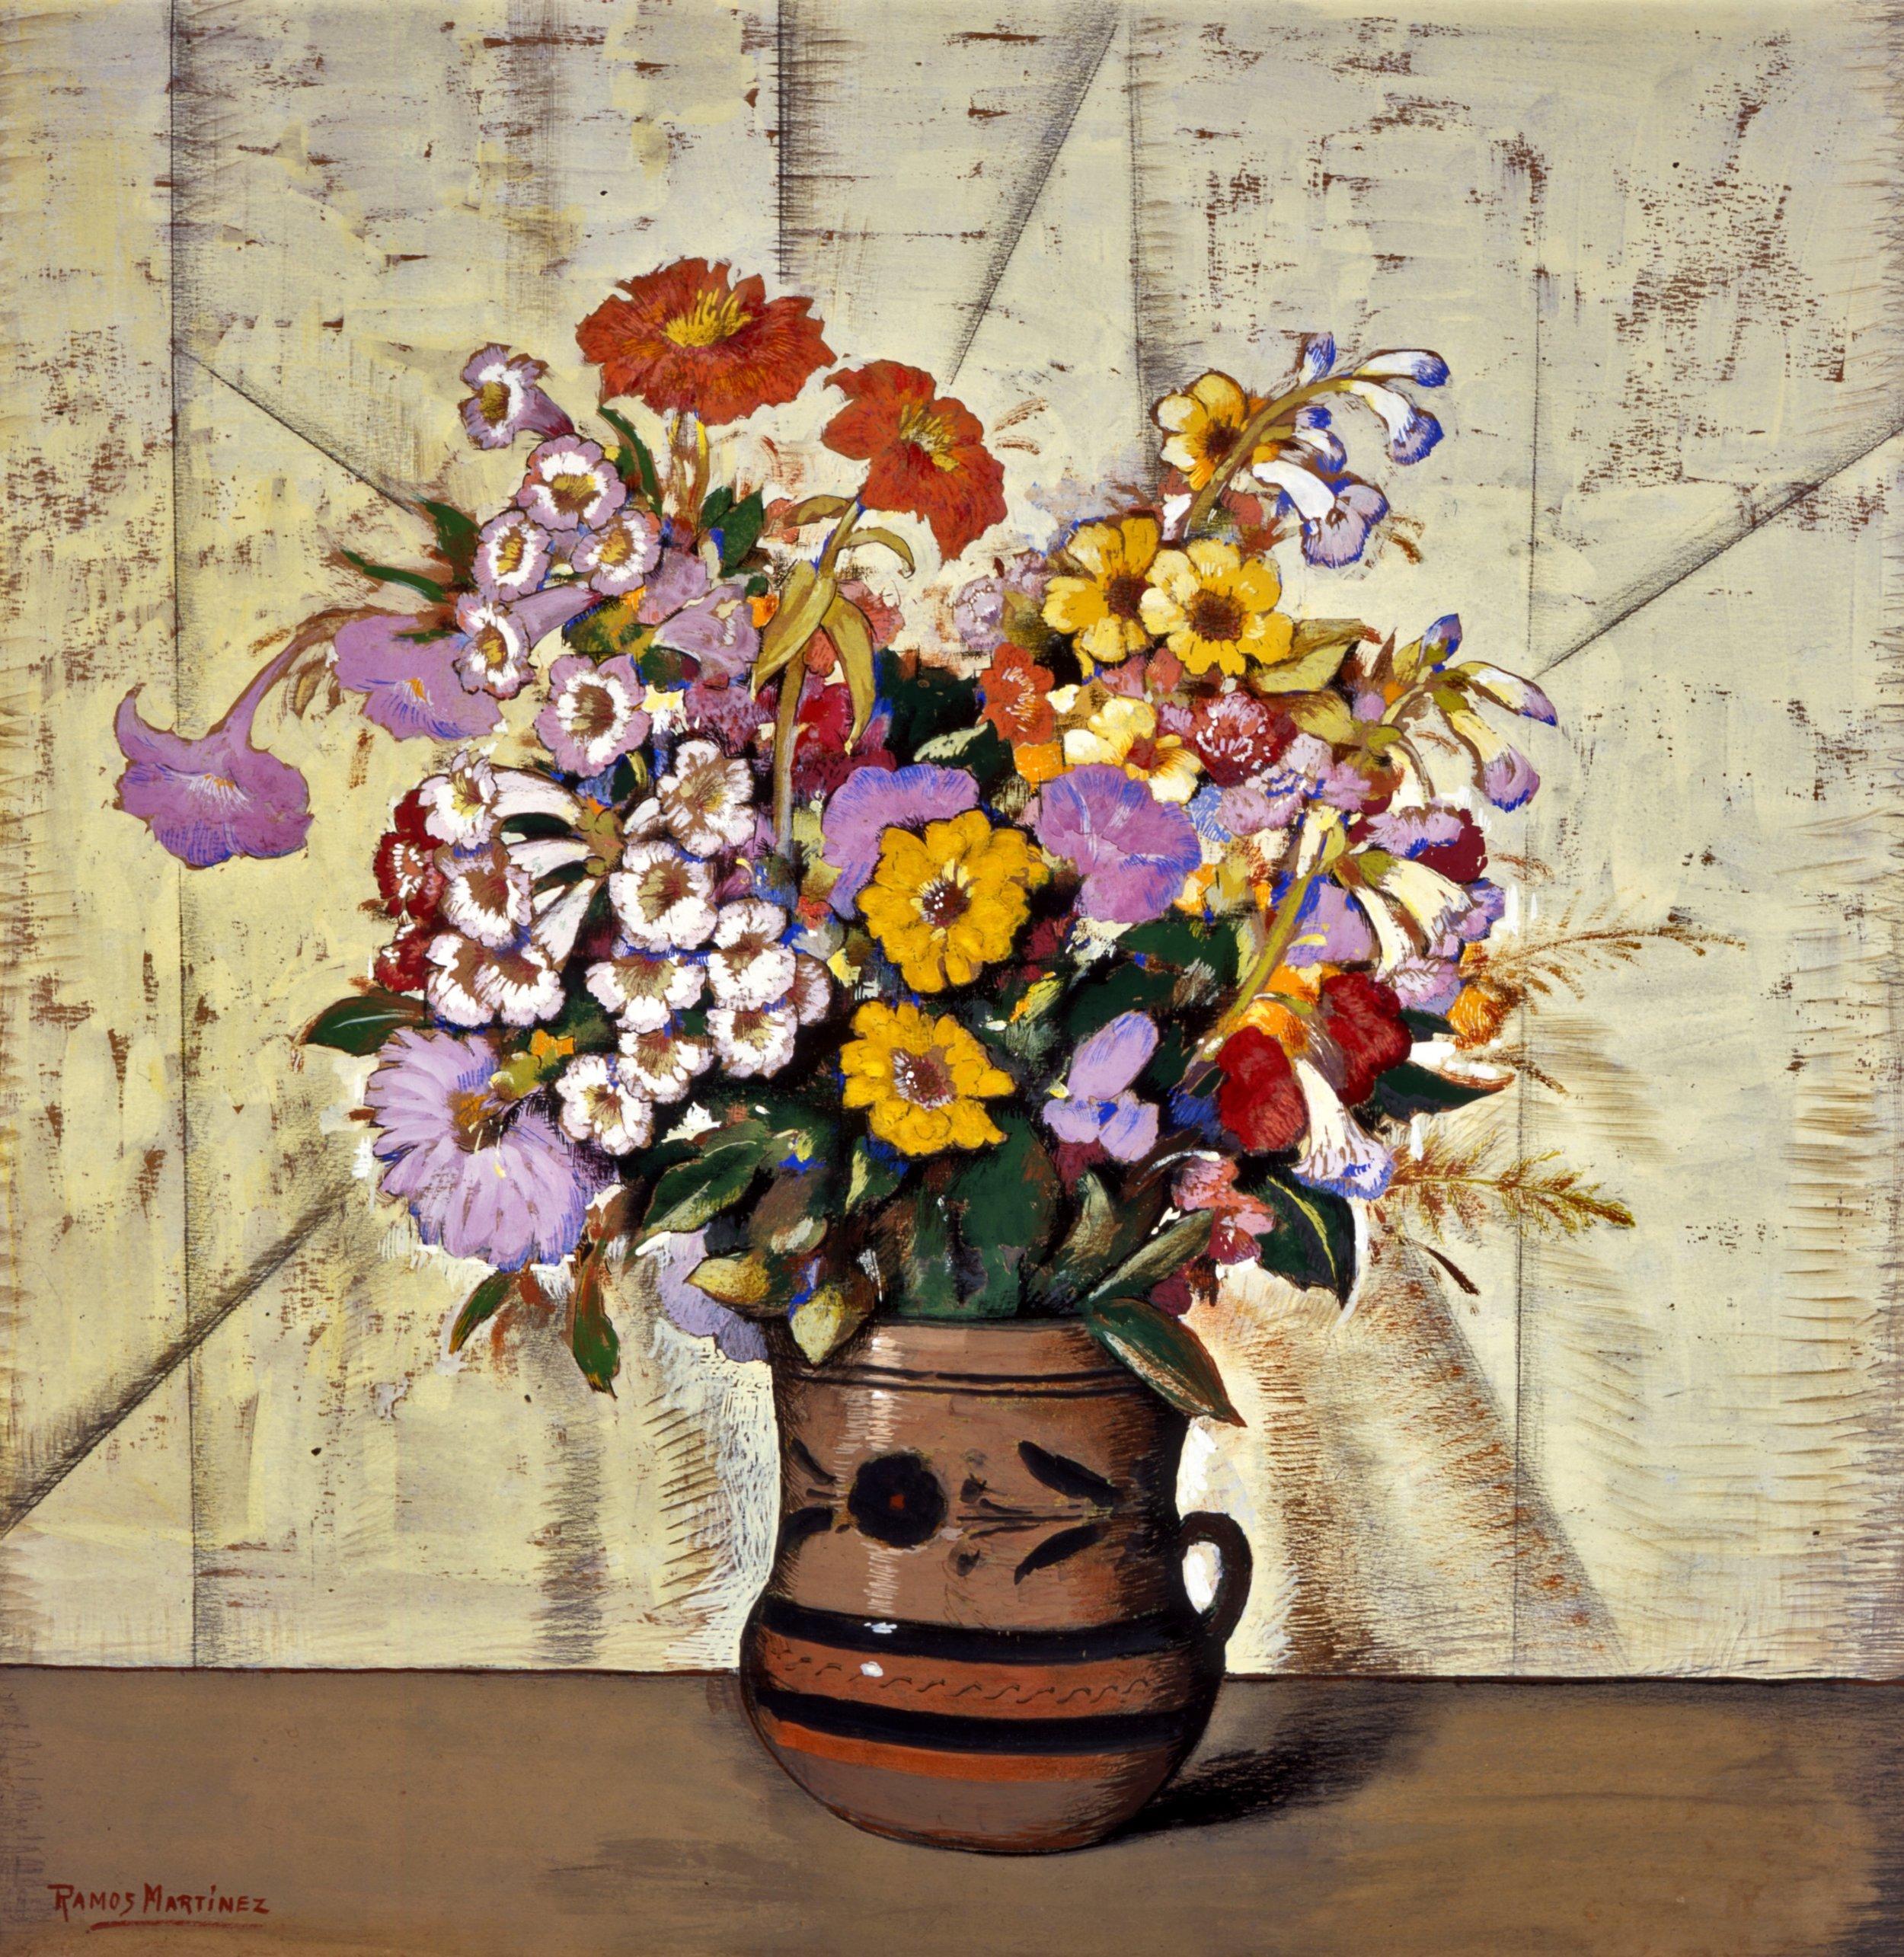 Flores / Flowers  ca. 1935 gouache, charcoal and graphite pen on board / aguada, carbón y lápiz grafito sobra tabla 24.9 x 24 inches; 63.2 x 61 centímetros Private collection